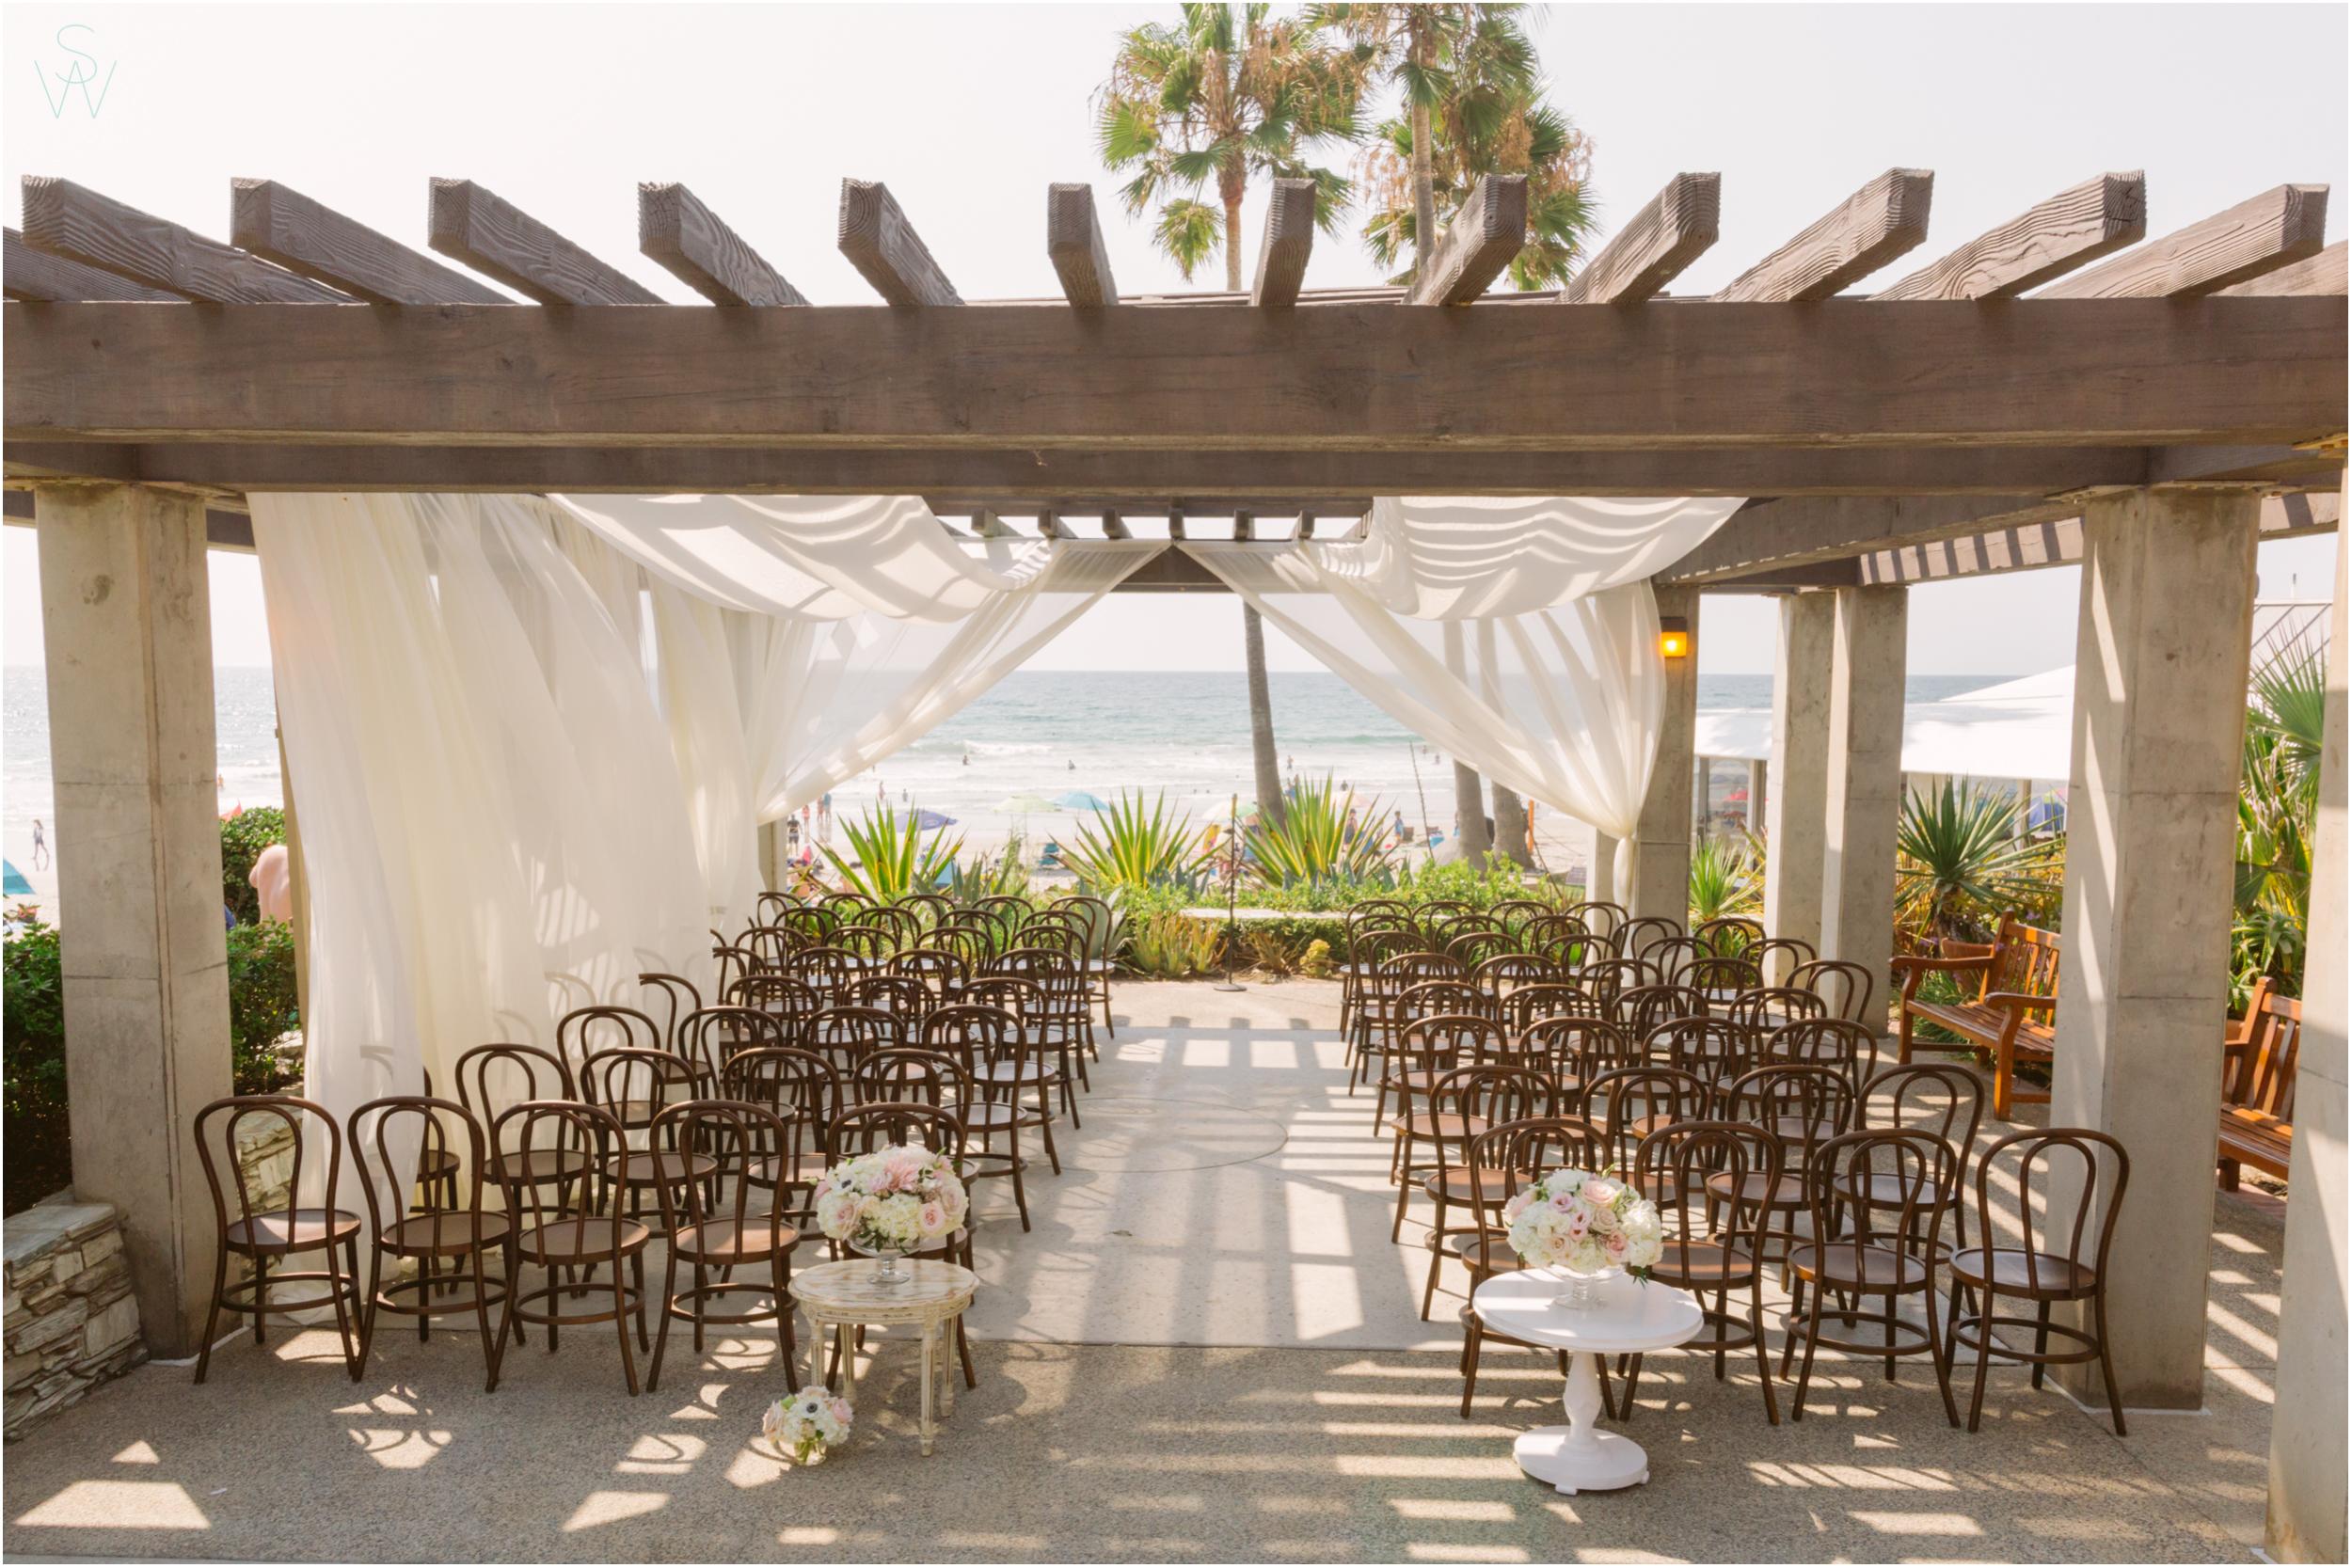 106DEL.MAR.WEDDINGS.Delmarpowerhouse.photography.shewanders.JPG